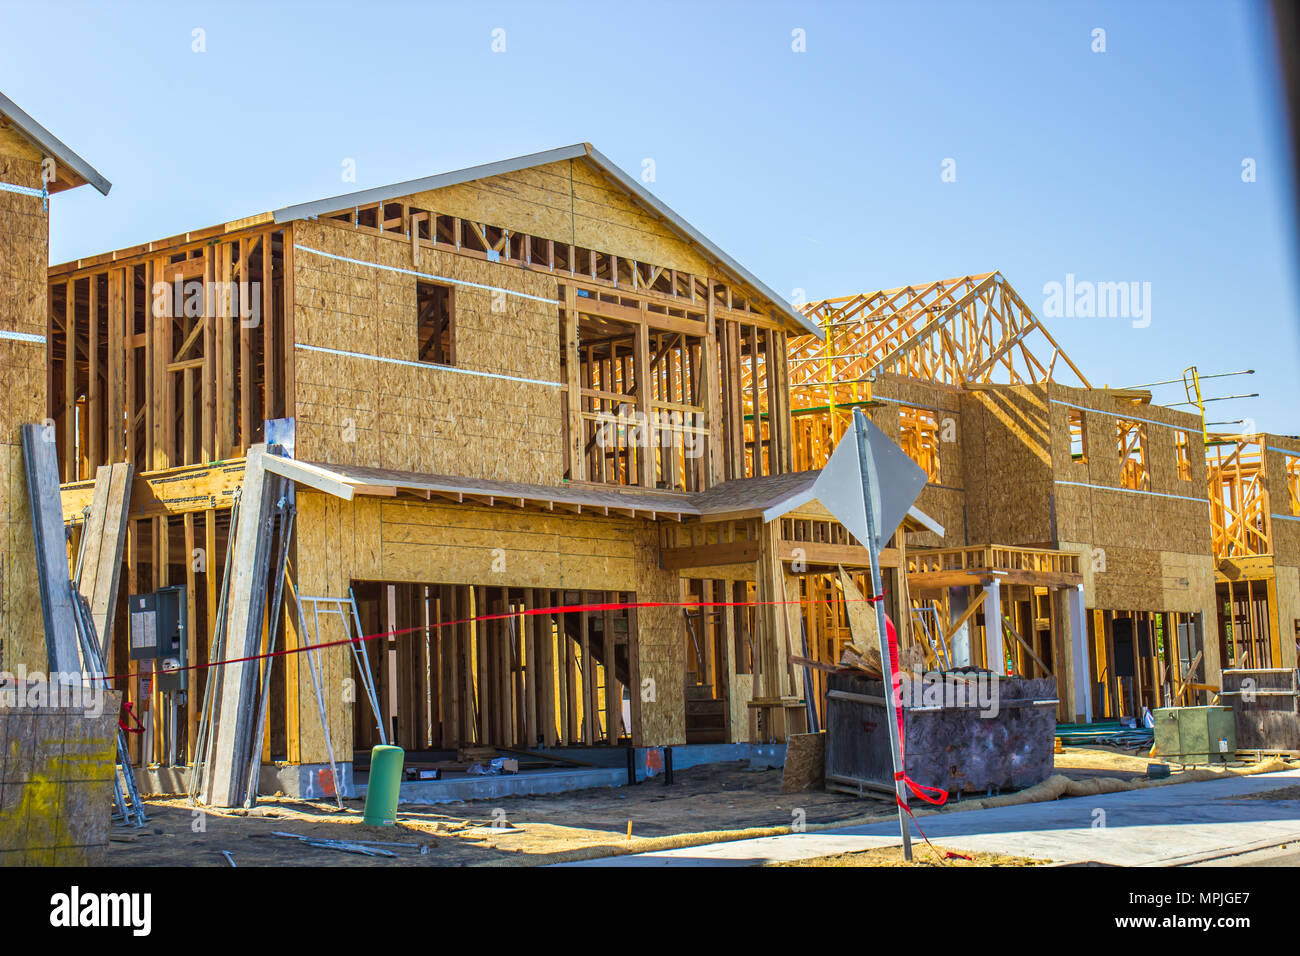 Neue Home Bau Framing & Sperrholz Stockfoto, Bild: 186034191 - Alamy